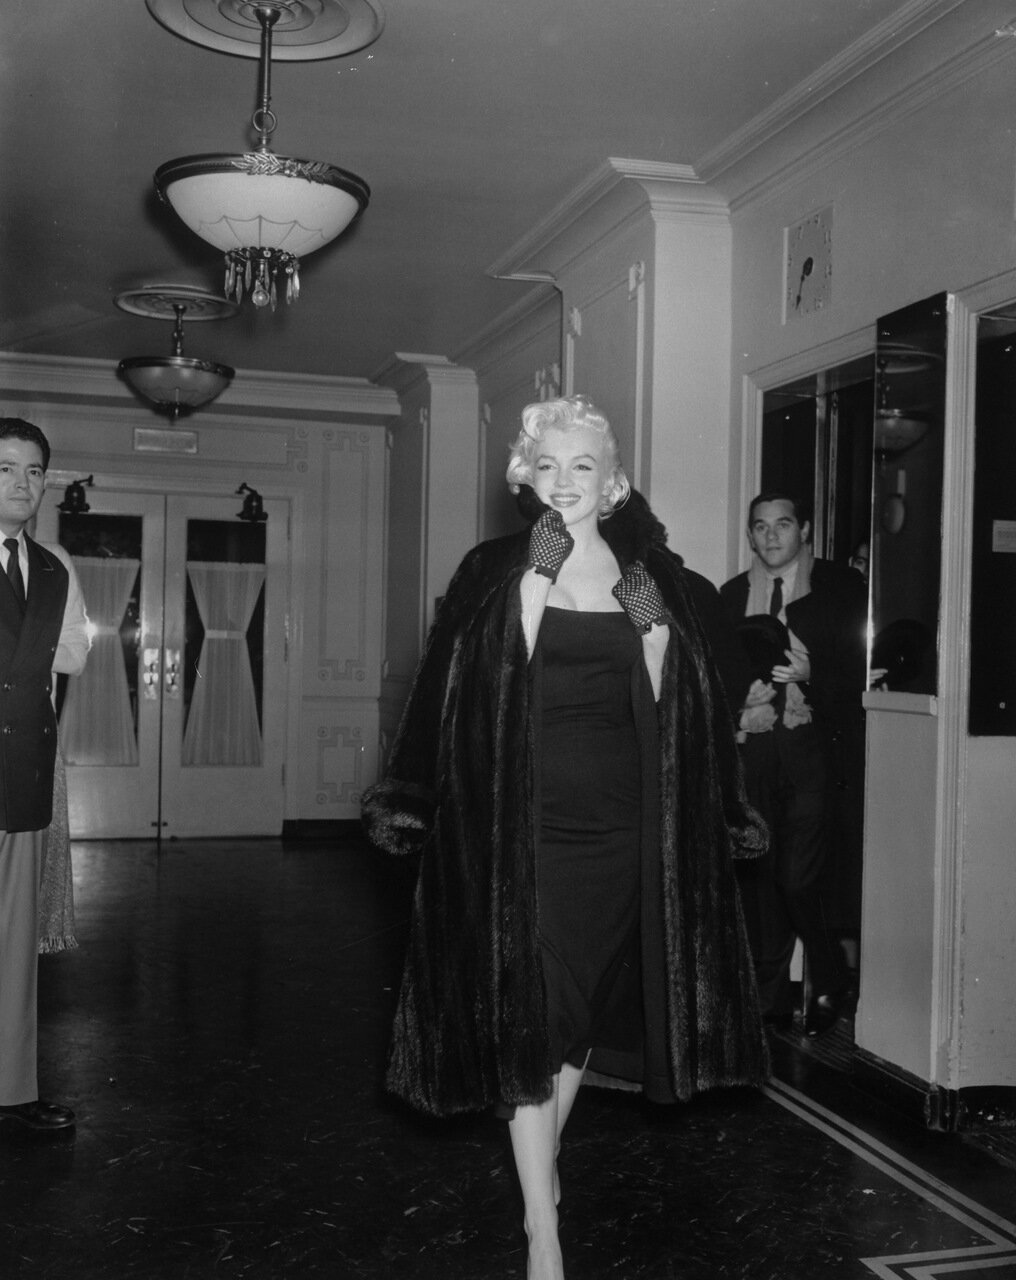 Marilyn Monroe Walking Down Hallway